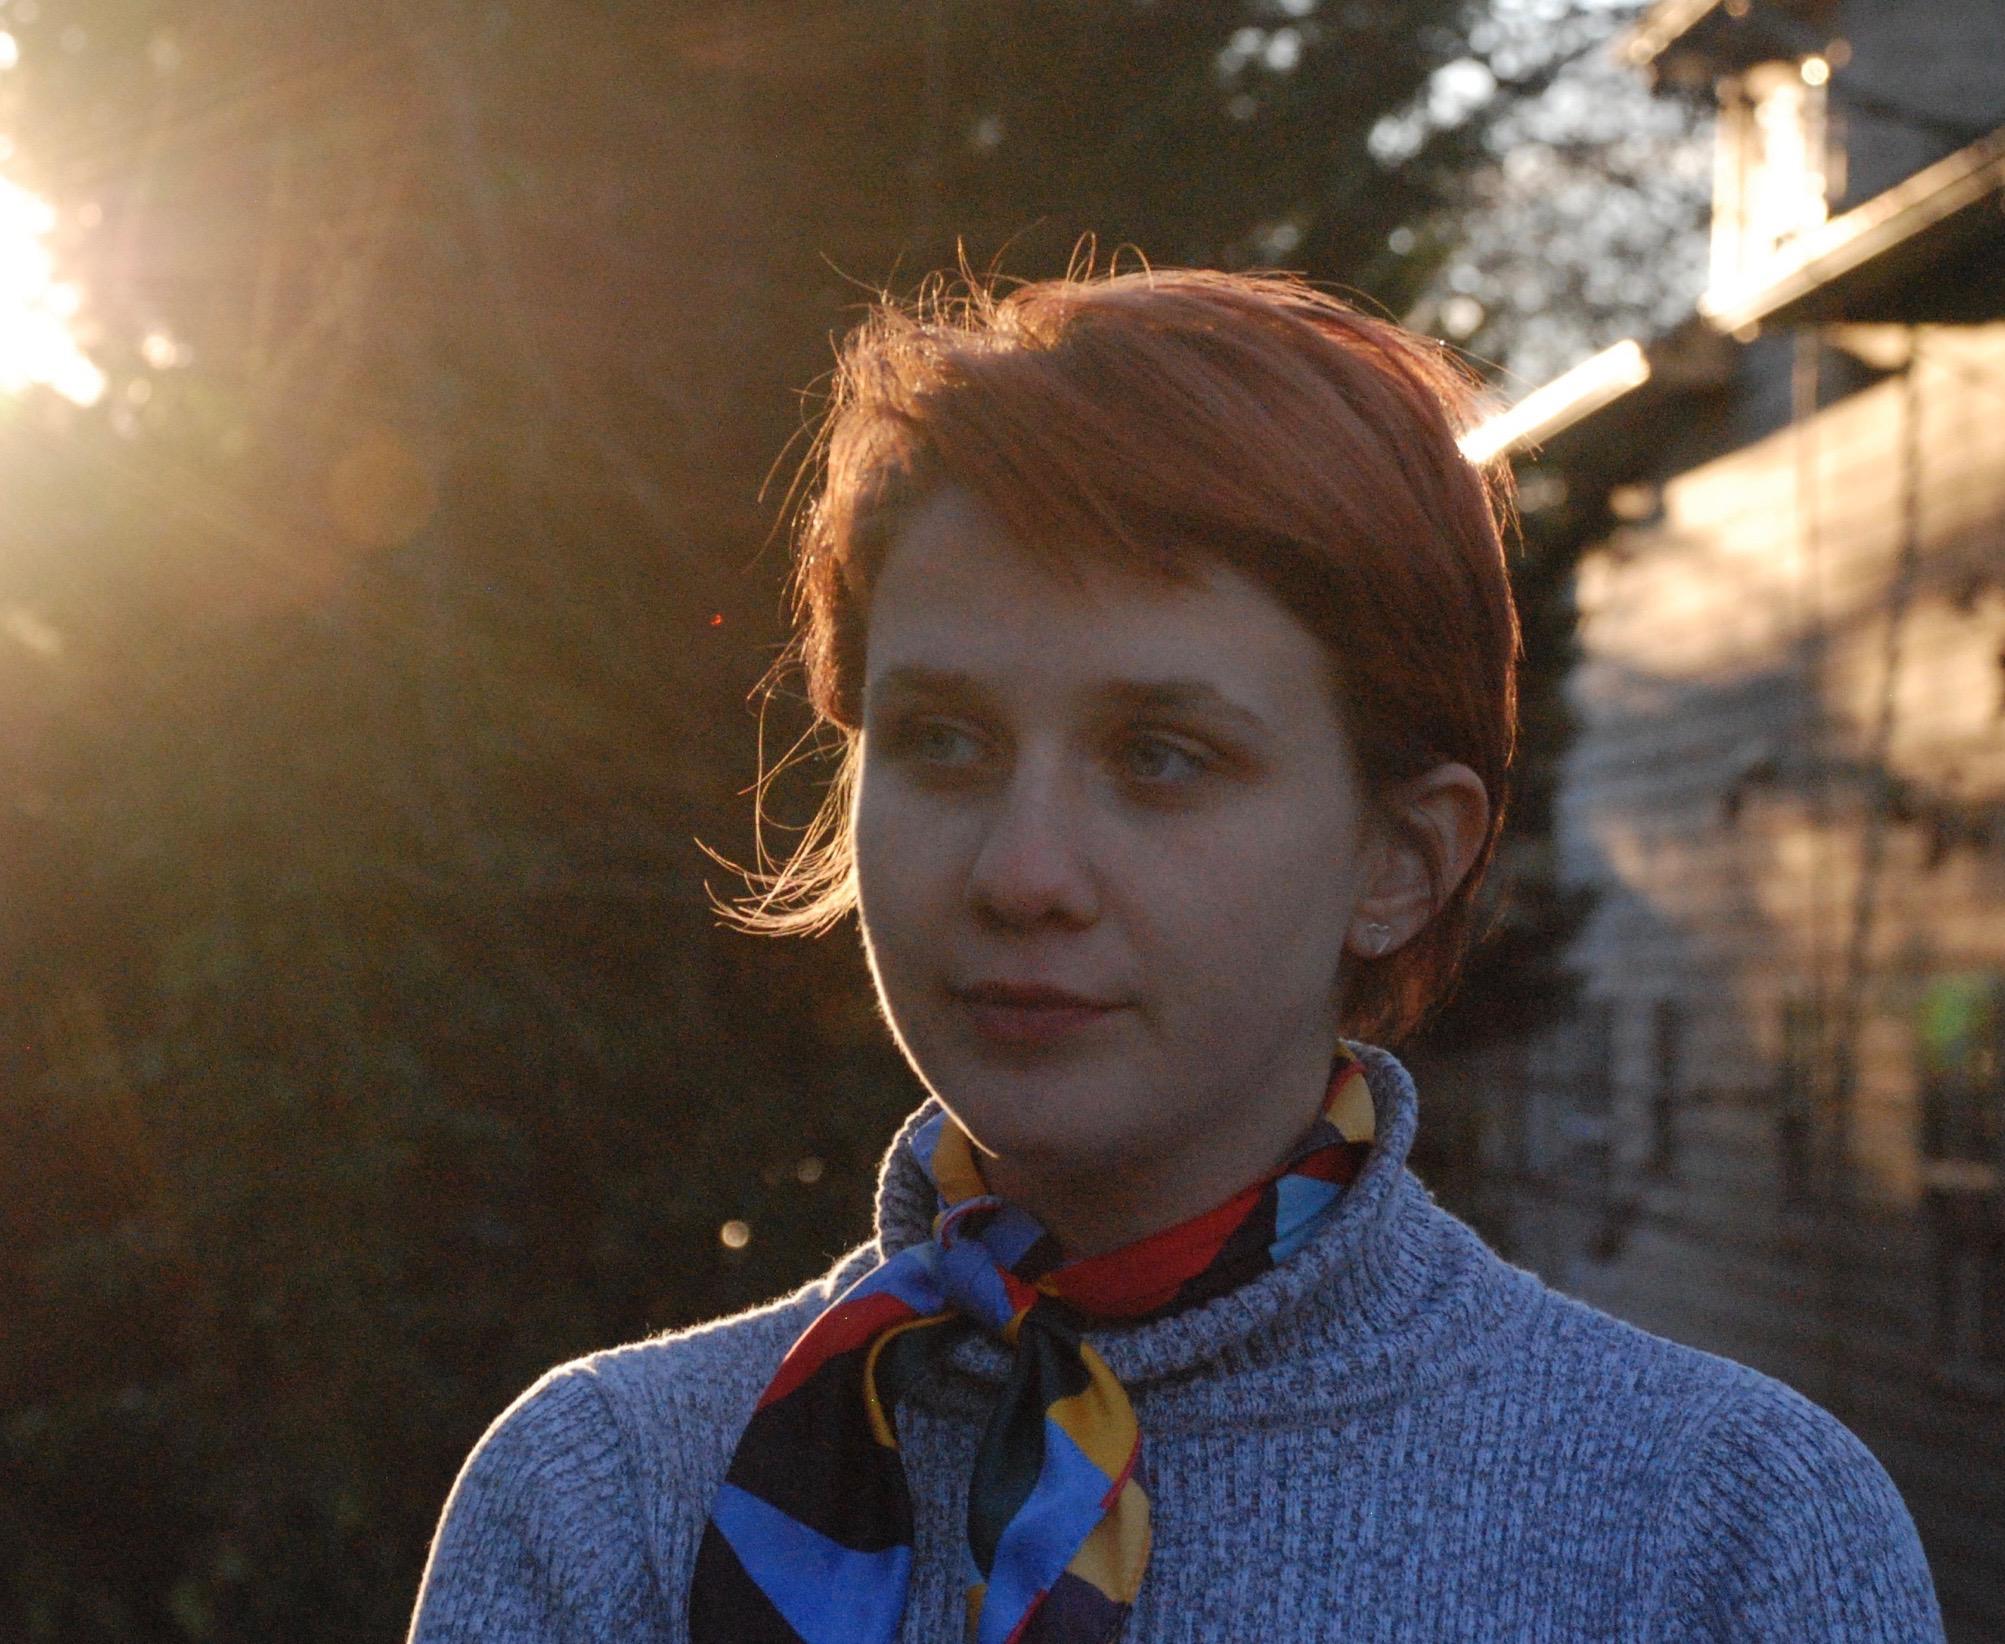 Samantha Farley